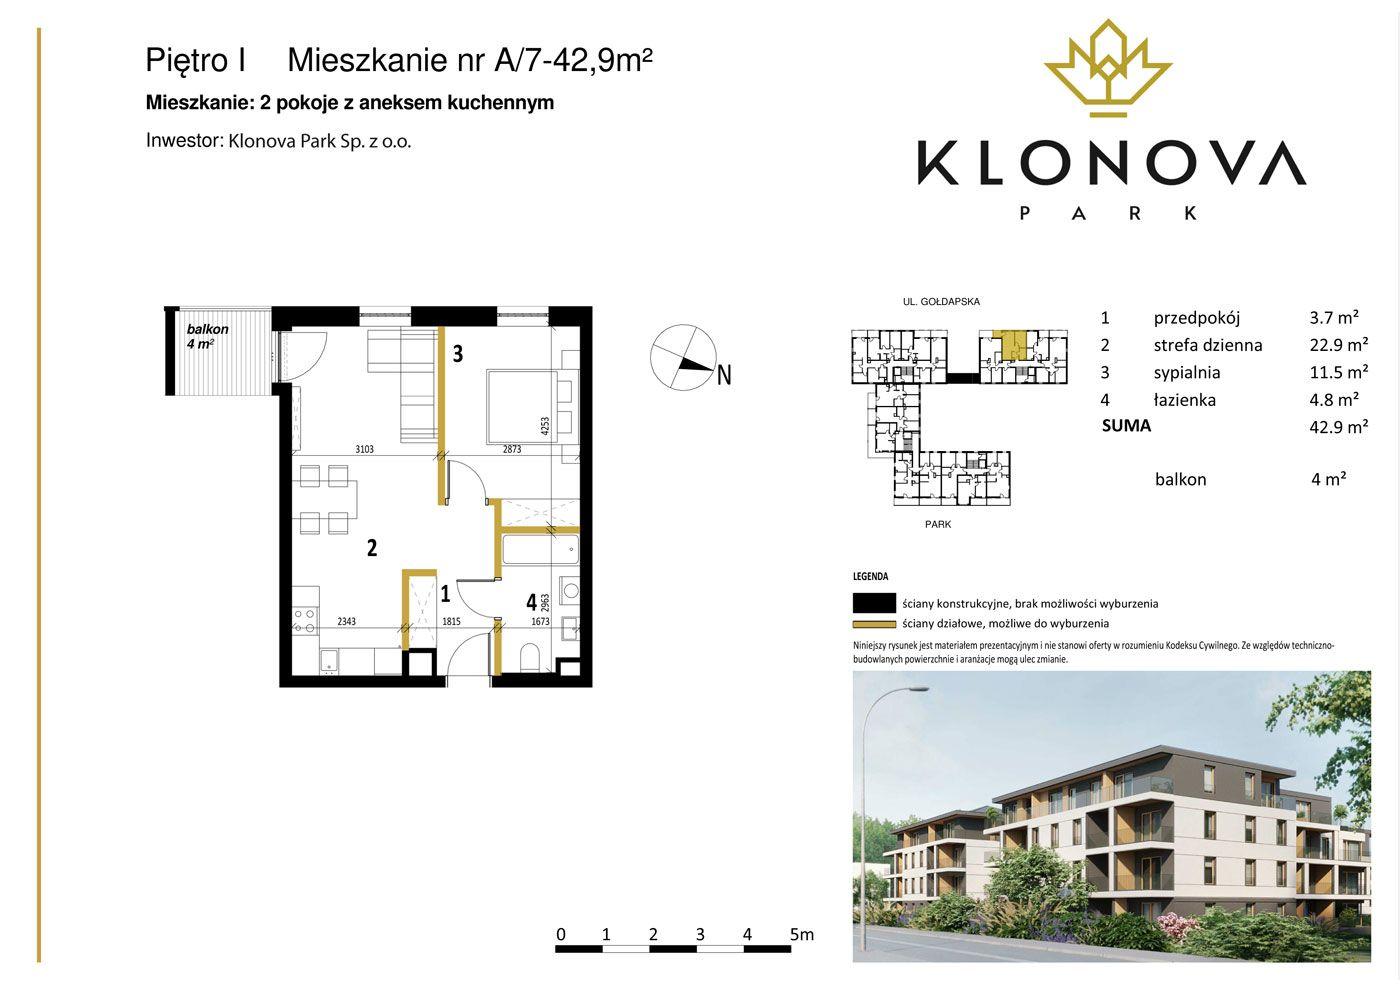 Apartamenty Klonova Park - Plan mieszkania A/7